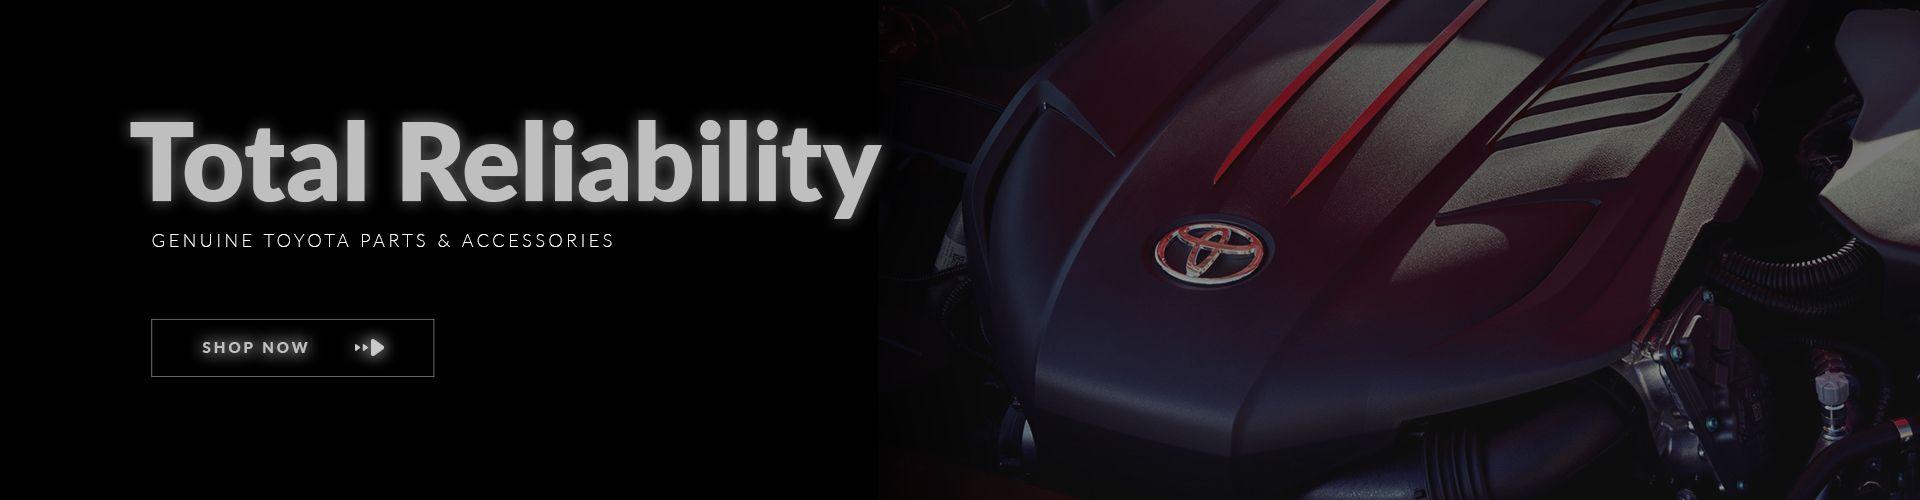 Shop OEM Toyota Parts & Accessories